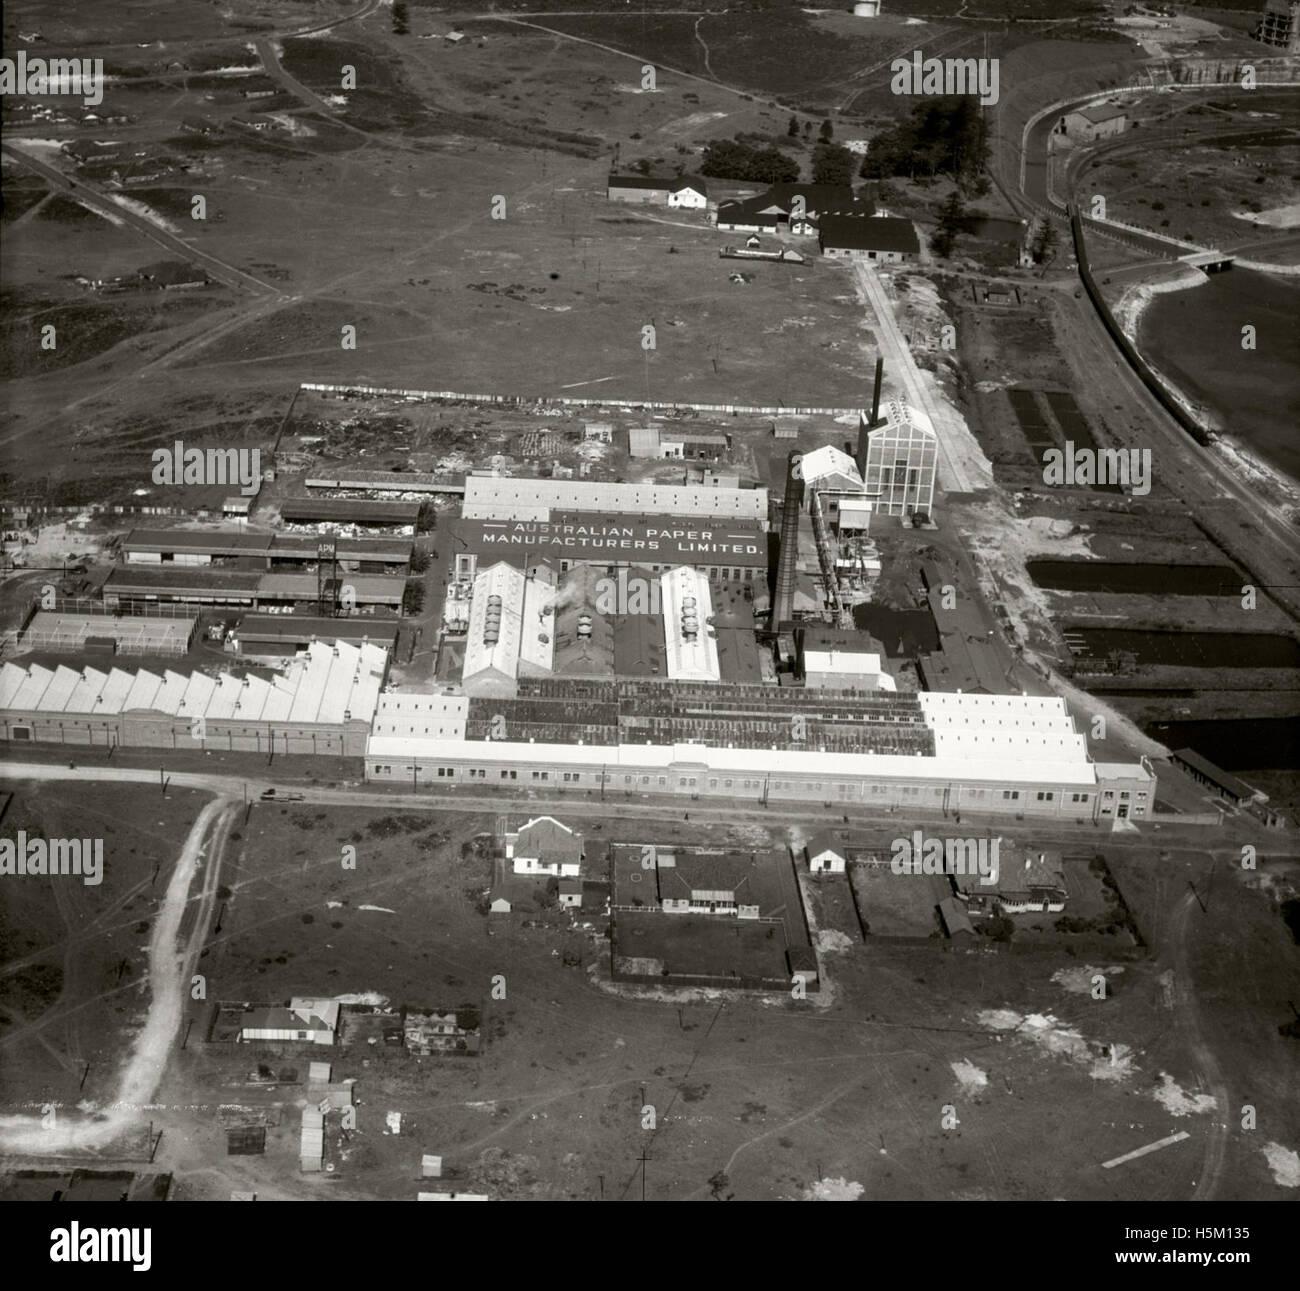 Australian Paper Manufacturing Ltd - 19 Sept 1935 - Stock Image